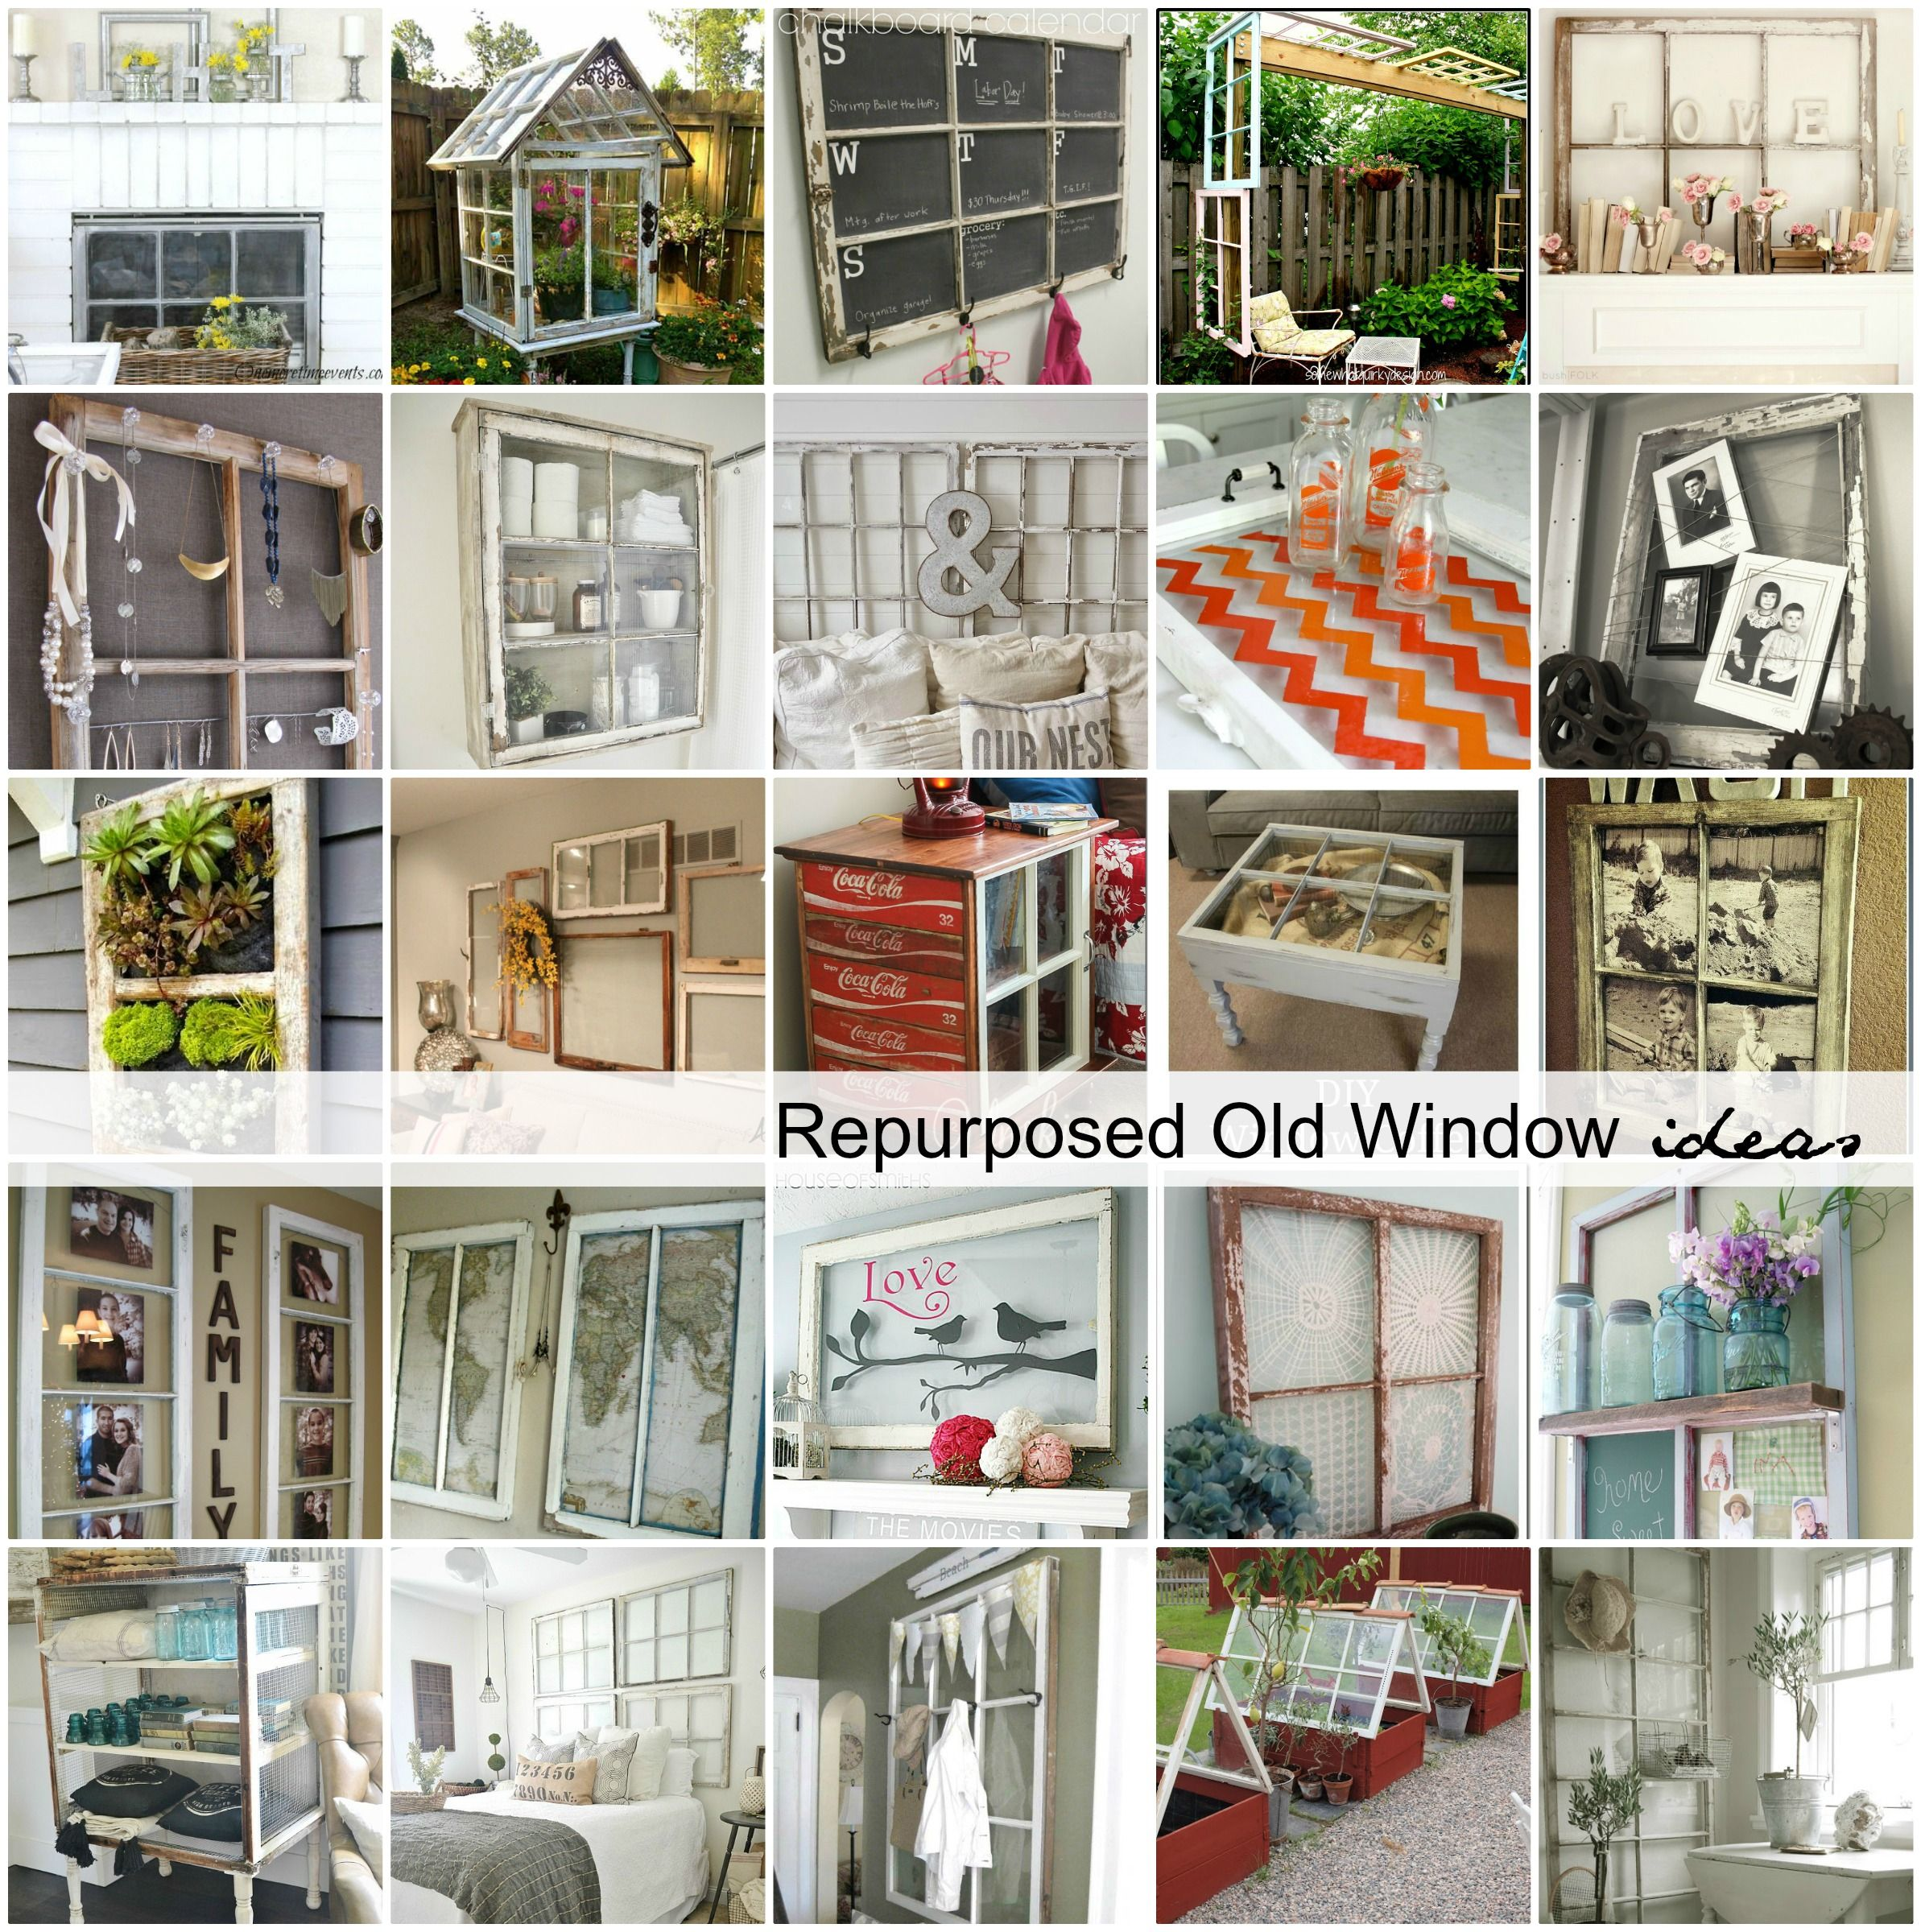 Repurposed Old Window Ideas Diy Projects Ideas Repurposed Old